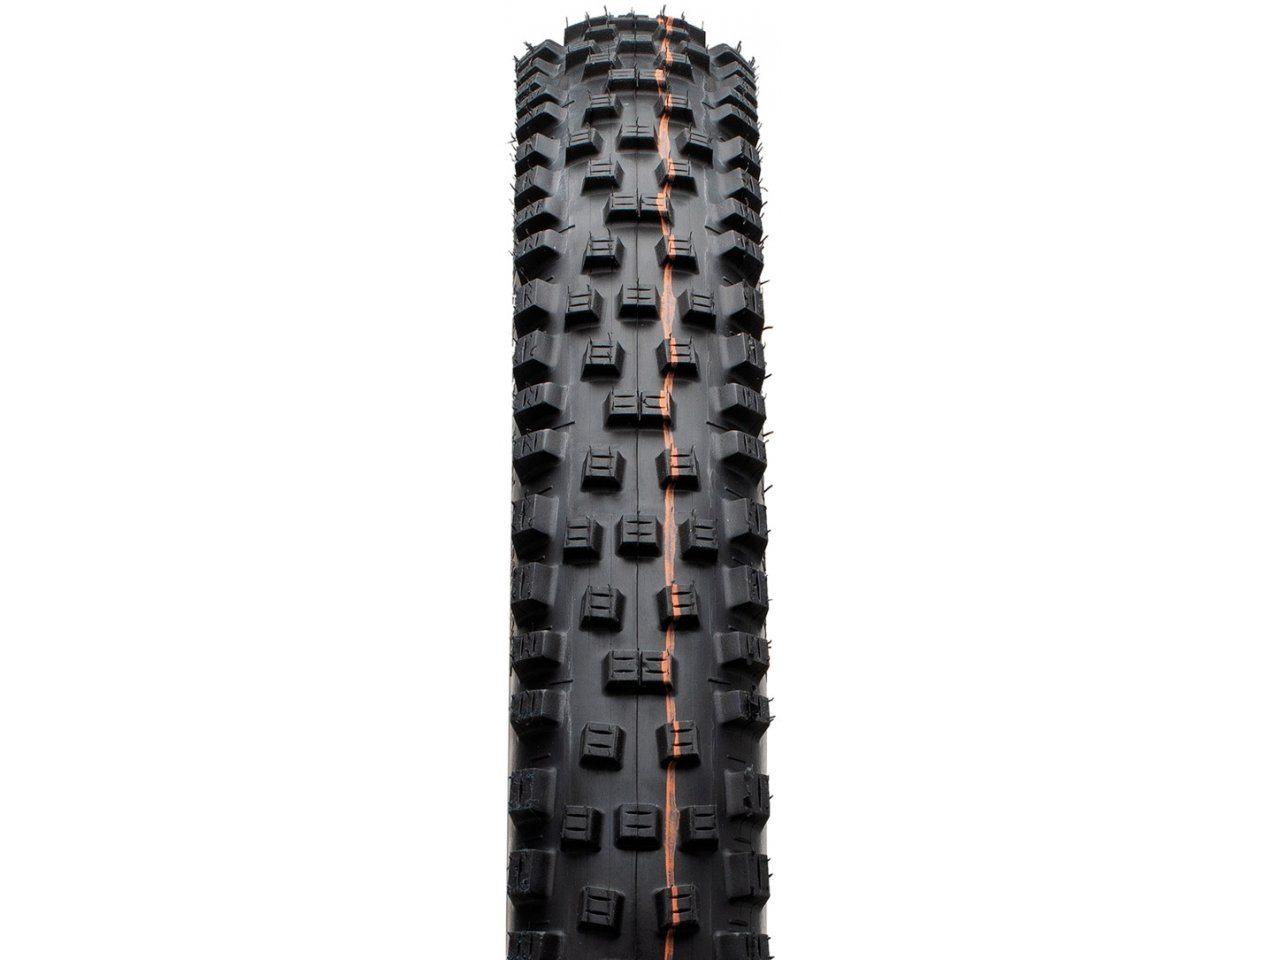 Schwalbe-Nobby-Nic-Evolution-ADDIX-Soft-Super-Trail-27-5-Folding-Tyre-black-27-5x2-35-78898-3...jpeg